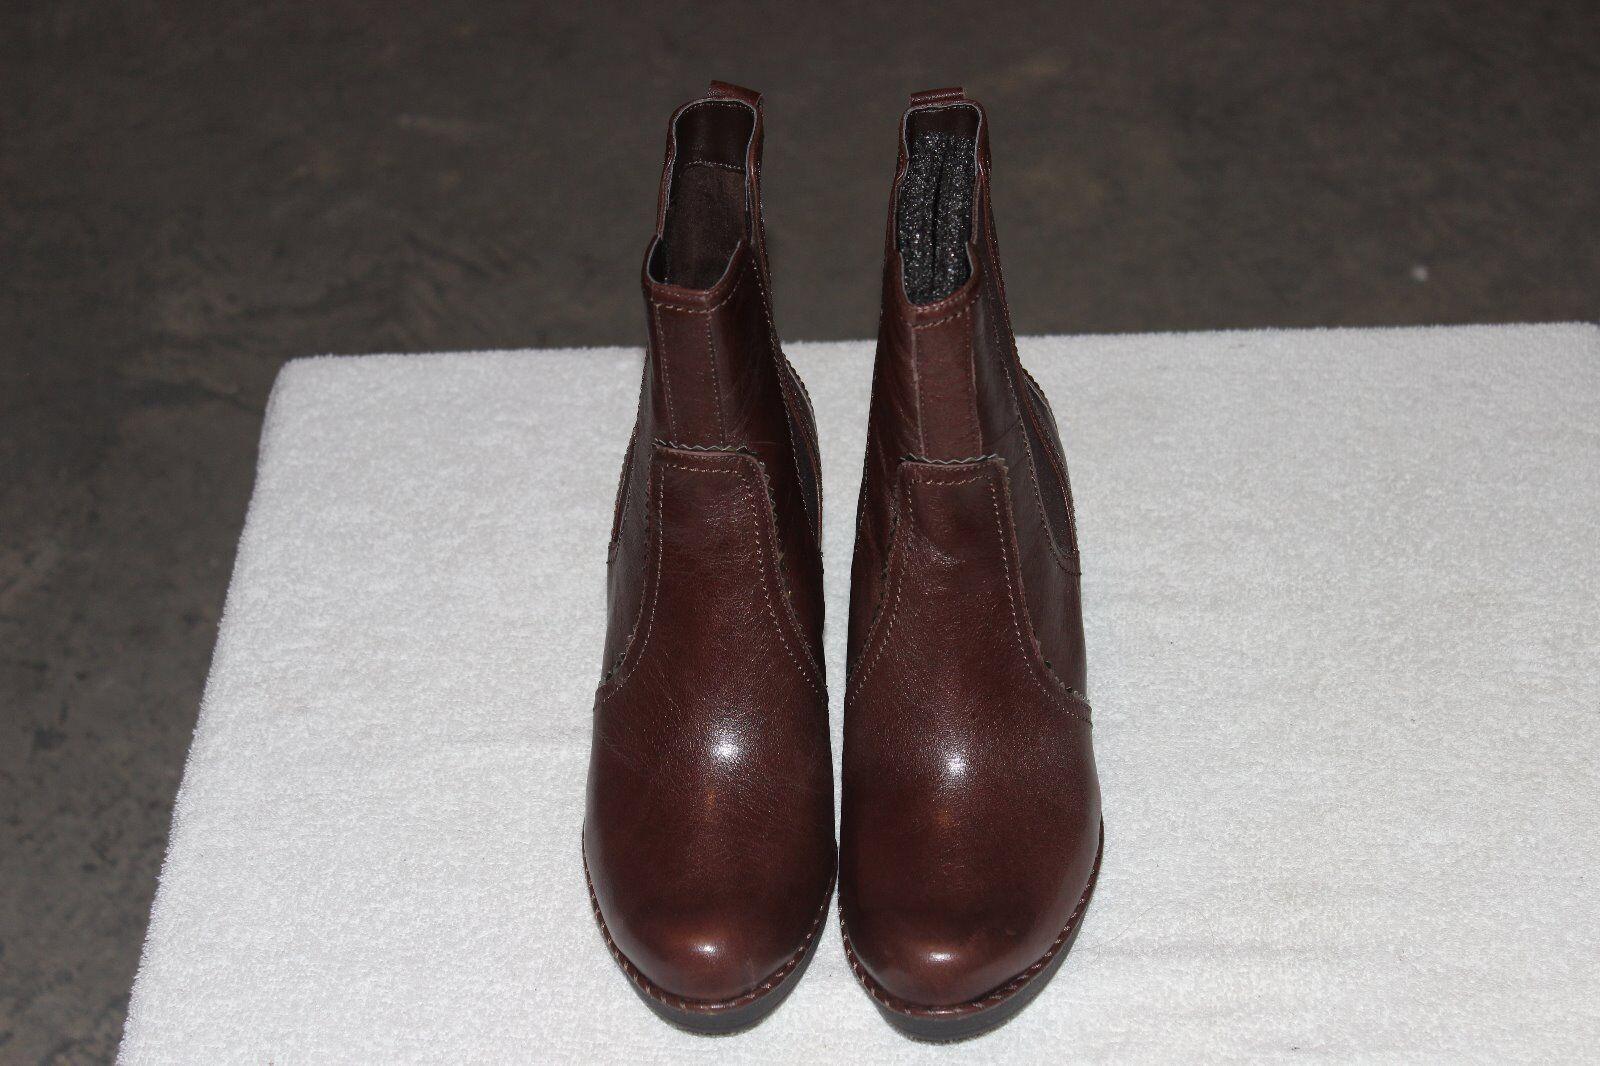 Rockport Rockport Rockport womens Anevia Chelsea boot K71965 size 8M eaf517